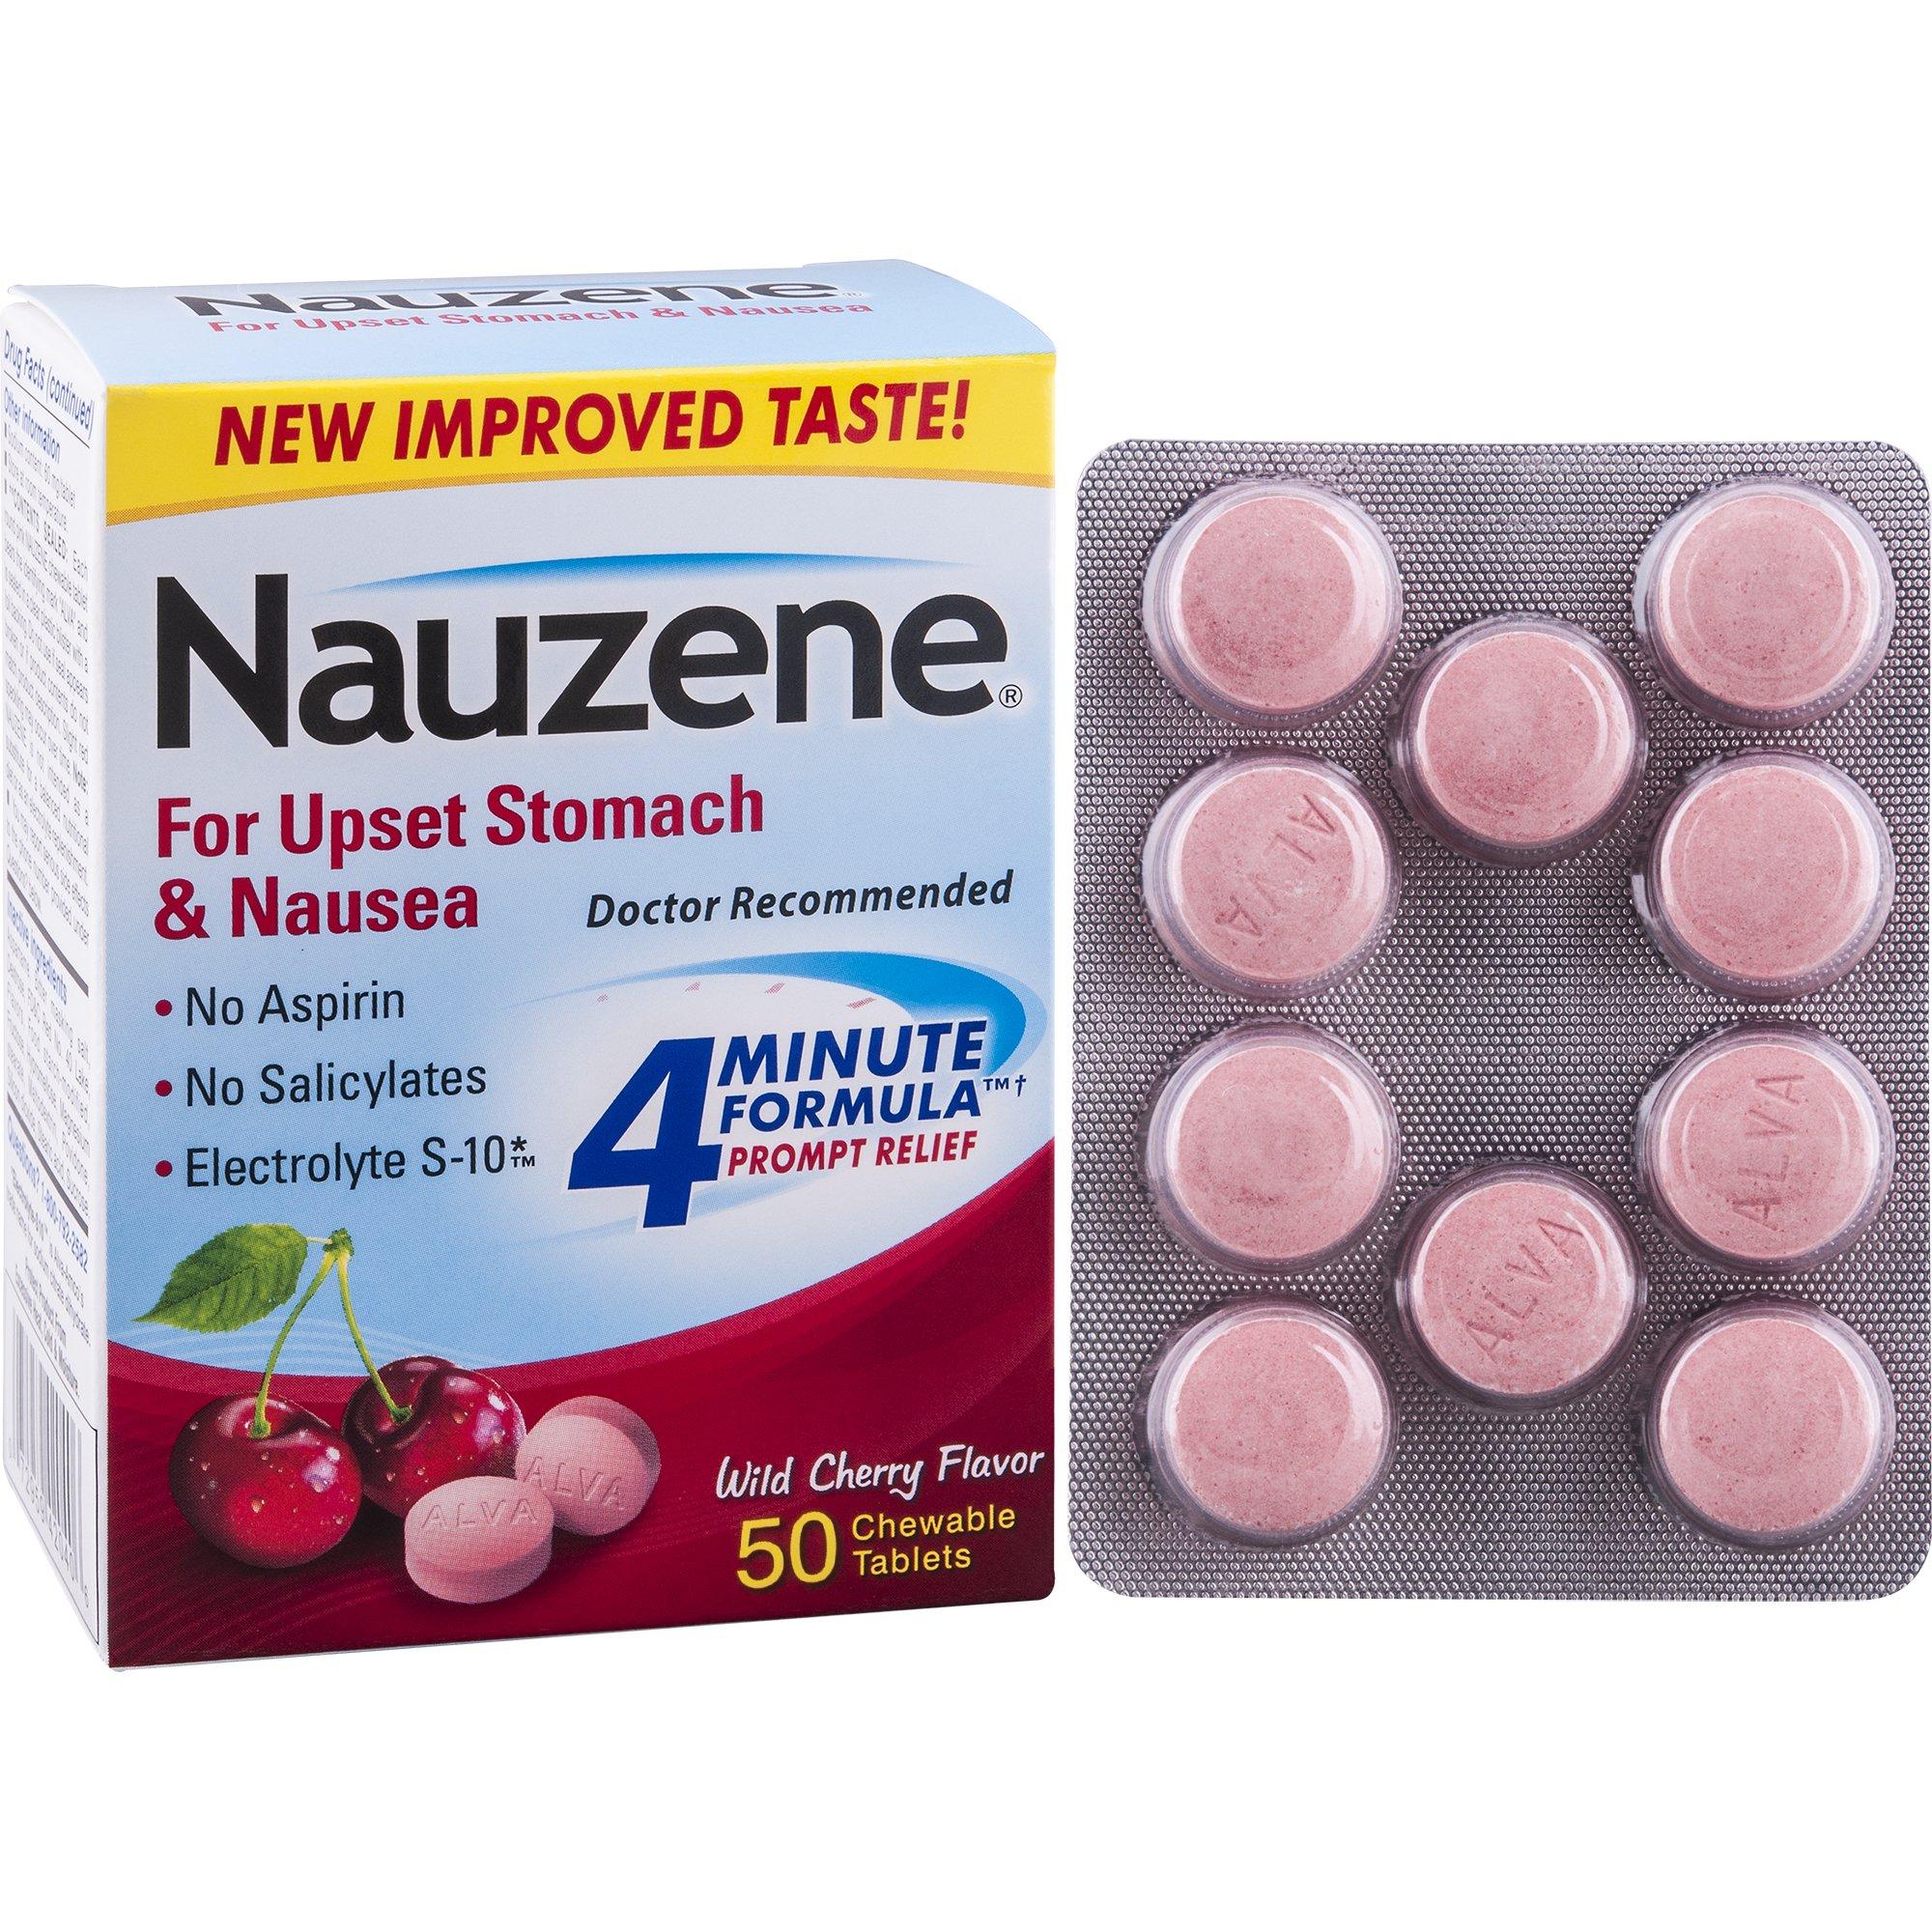 Nauzene For Nausea Chewable Tablets, Wild Cherry, 50 Count by Nauzene (Image #3)